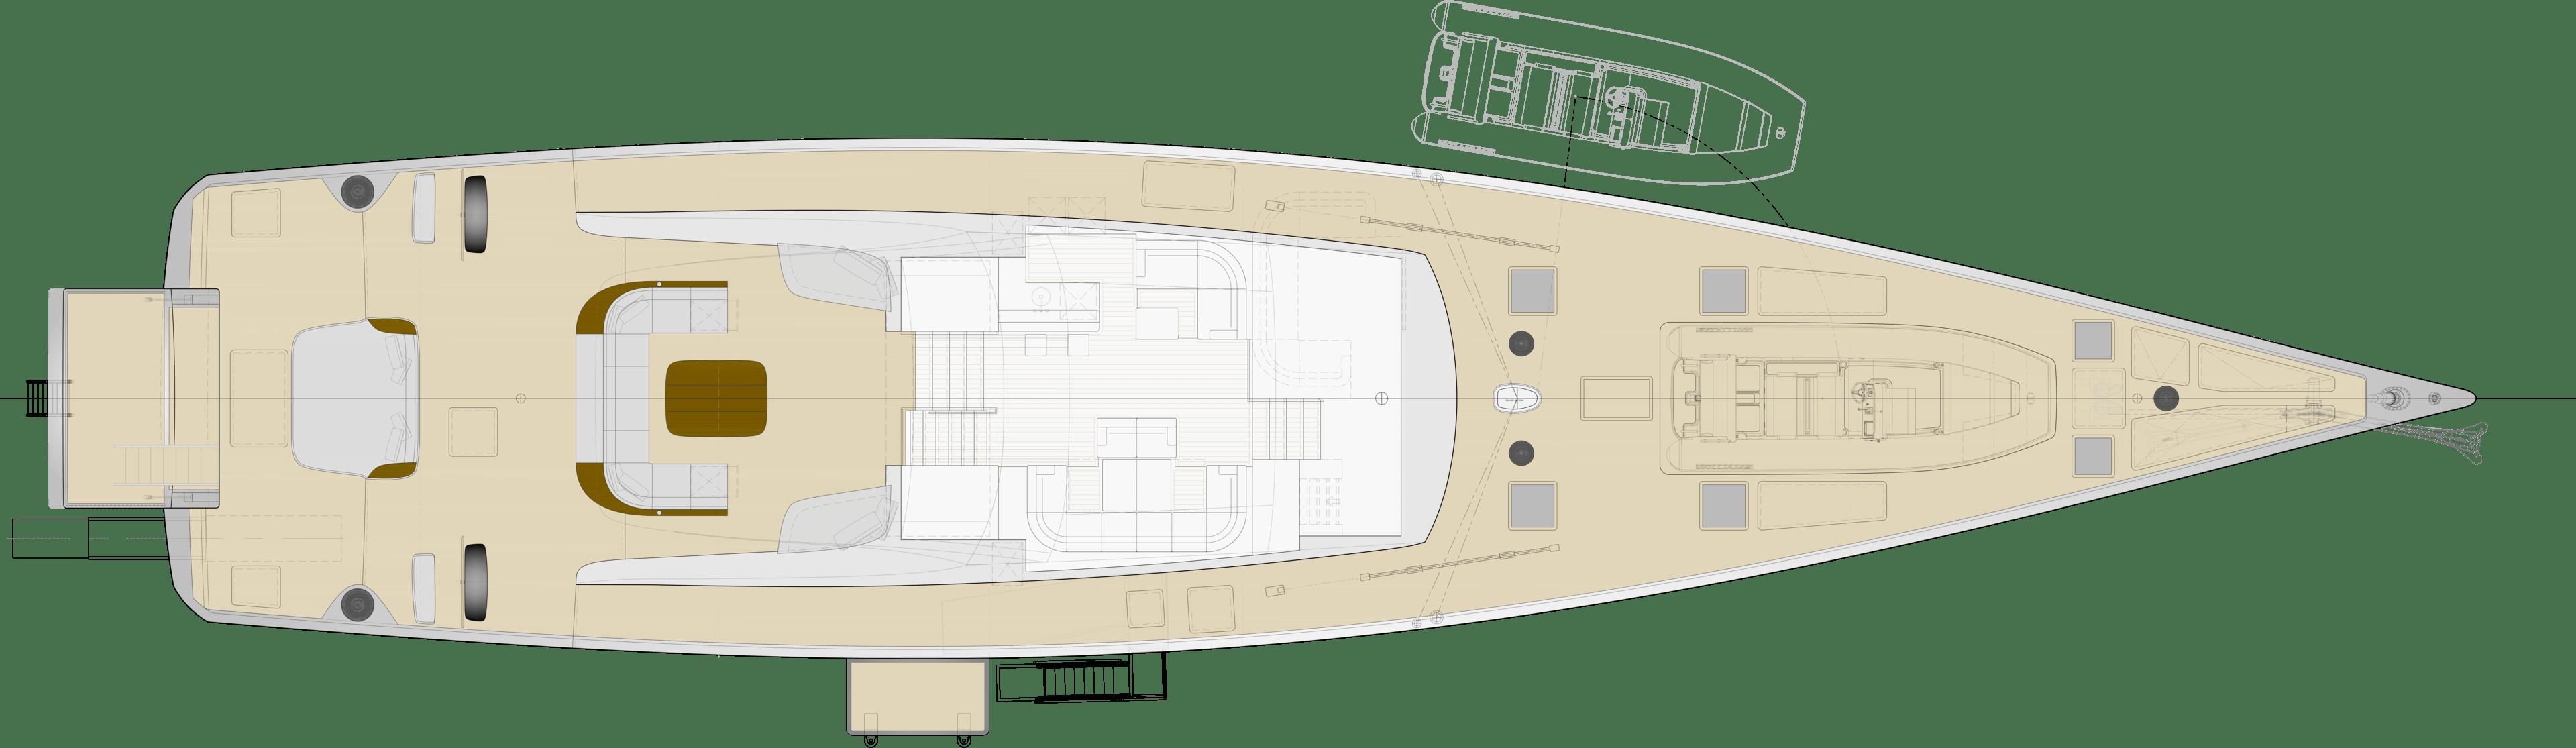 MMYD_065_38m Sloop_A_GA5_Deck Plan_publicity.png